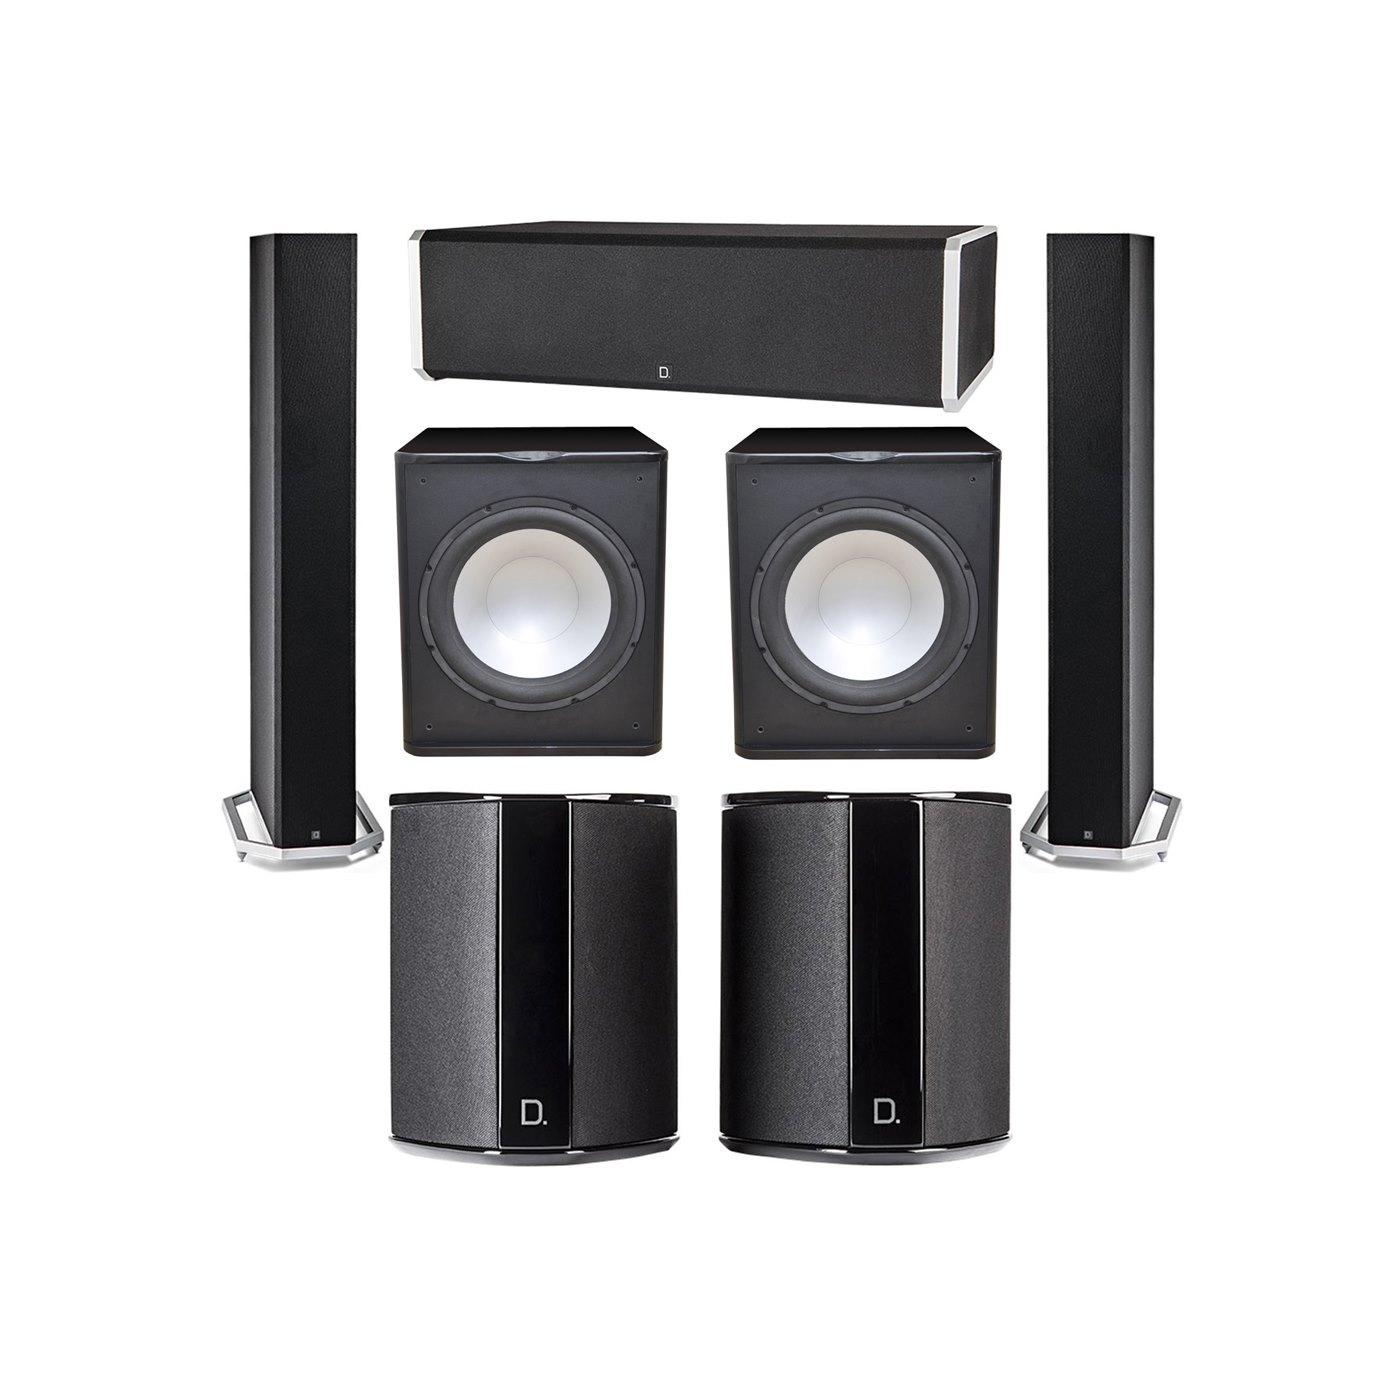 Definitive Technology 5.2 System with 2 BP9060 Tower Speakers, 1 CS9060 Center Channel Speaker, 2 SR9040 Surround Speaker, 2 Premier Acoustic PA-150 Subwoofer